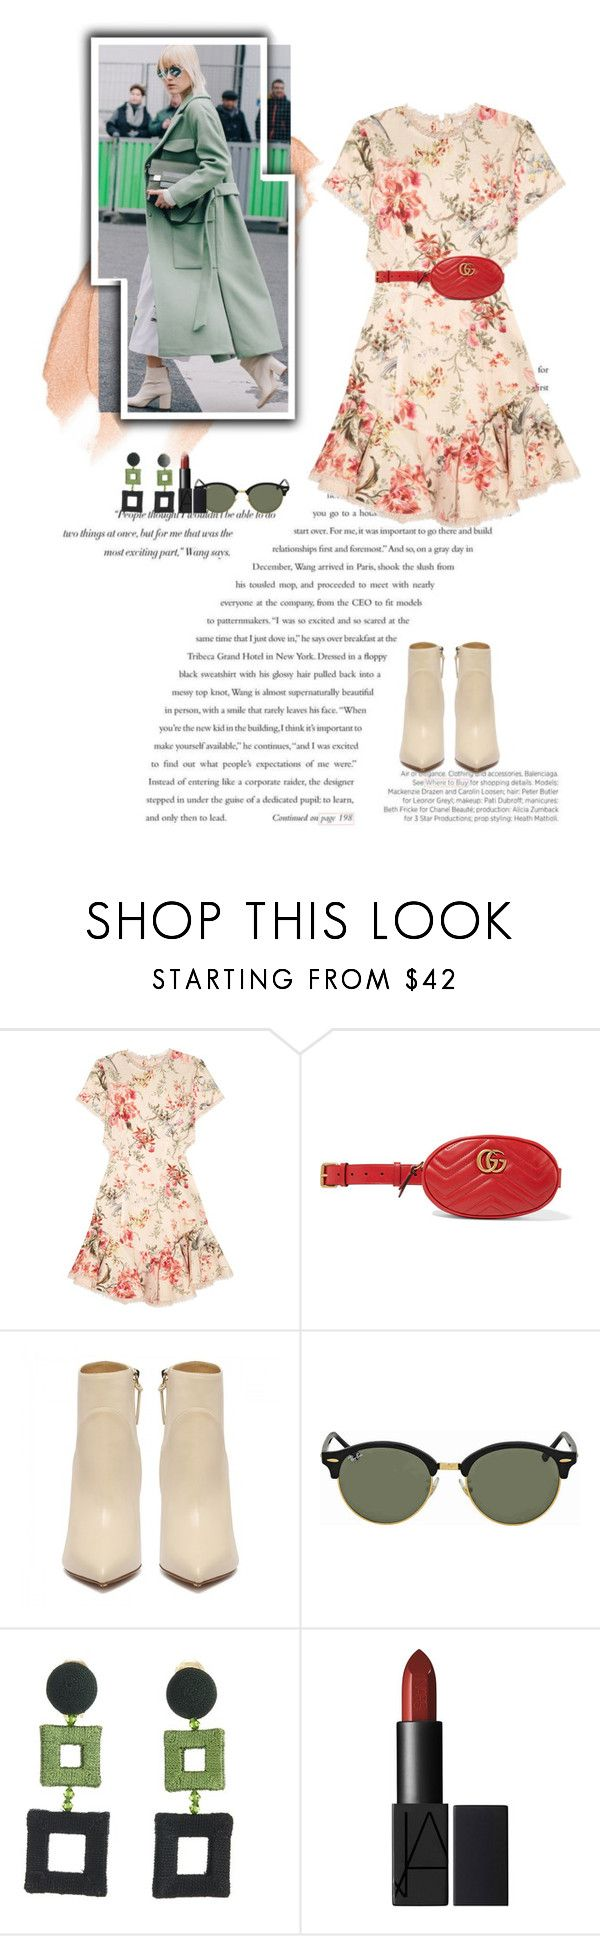 """Belt Bag..."" by unamiradaatuarmario ❤ liked on Polyvore featuring Balenciaga, Zimmermann, Gucci, Ray-Ban, Oscar de la Renta, Too Faced Cosmetics, statementbags and spring2018"